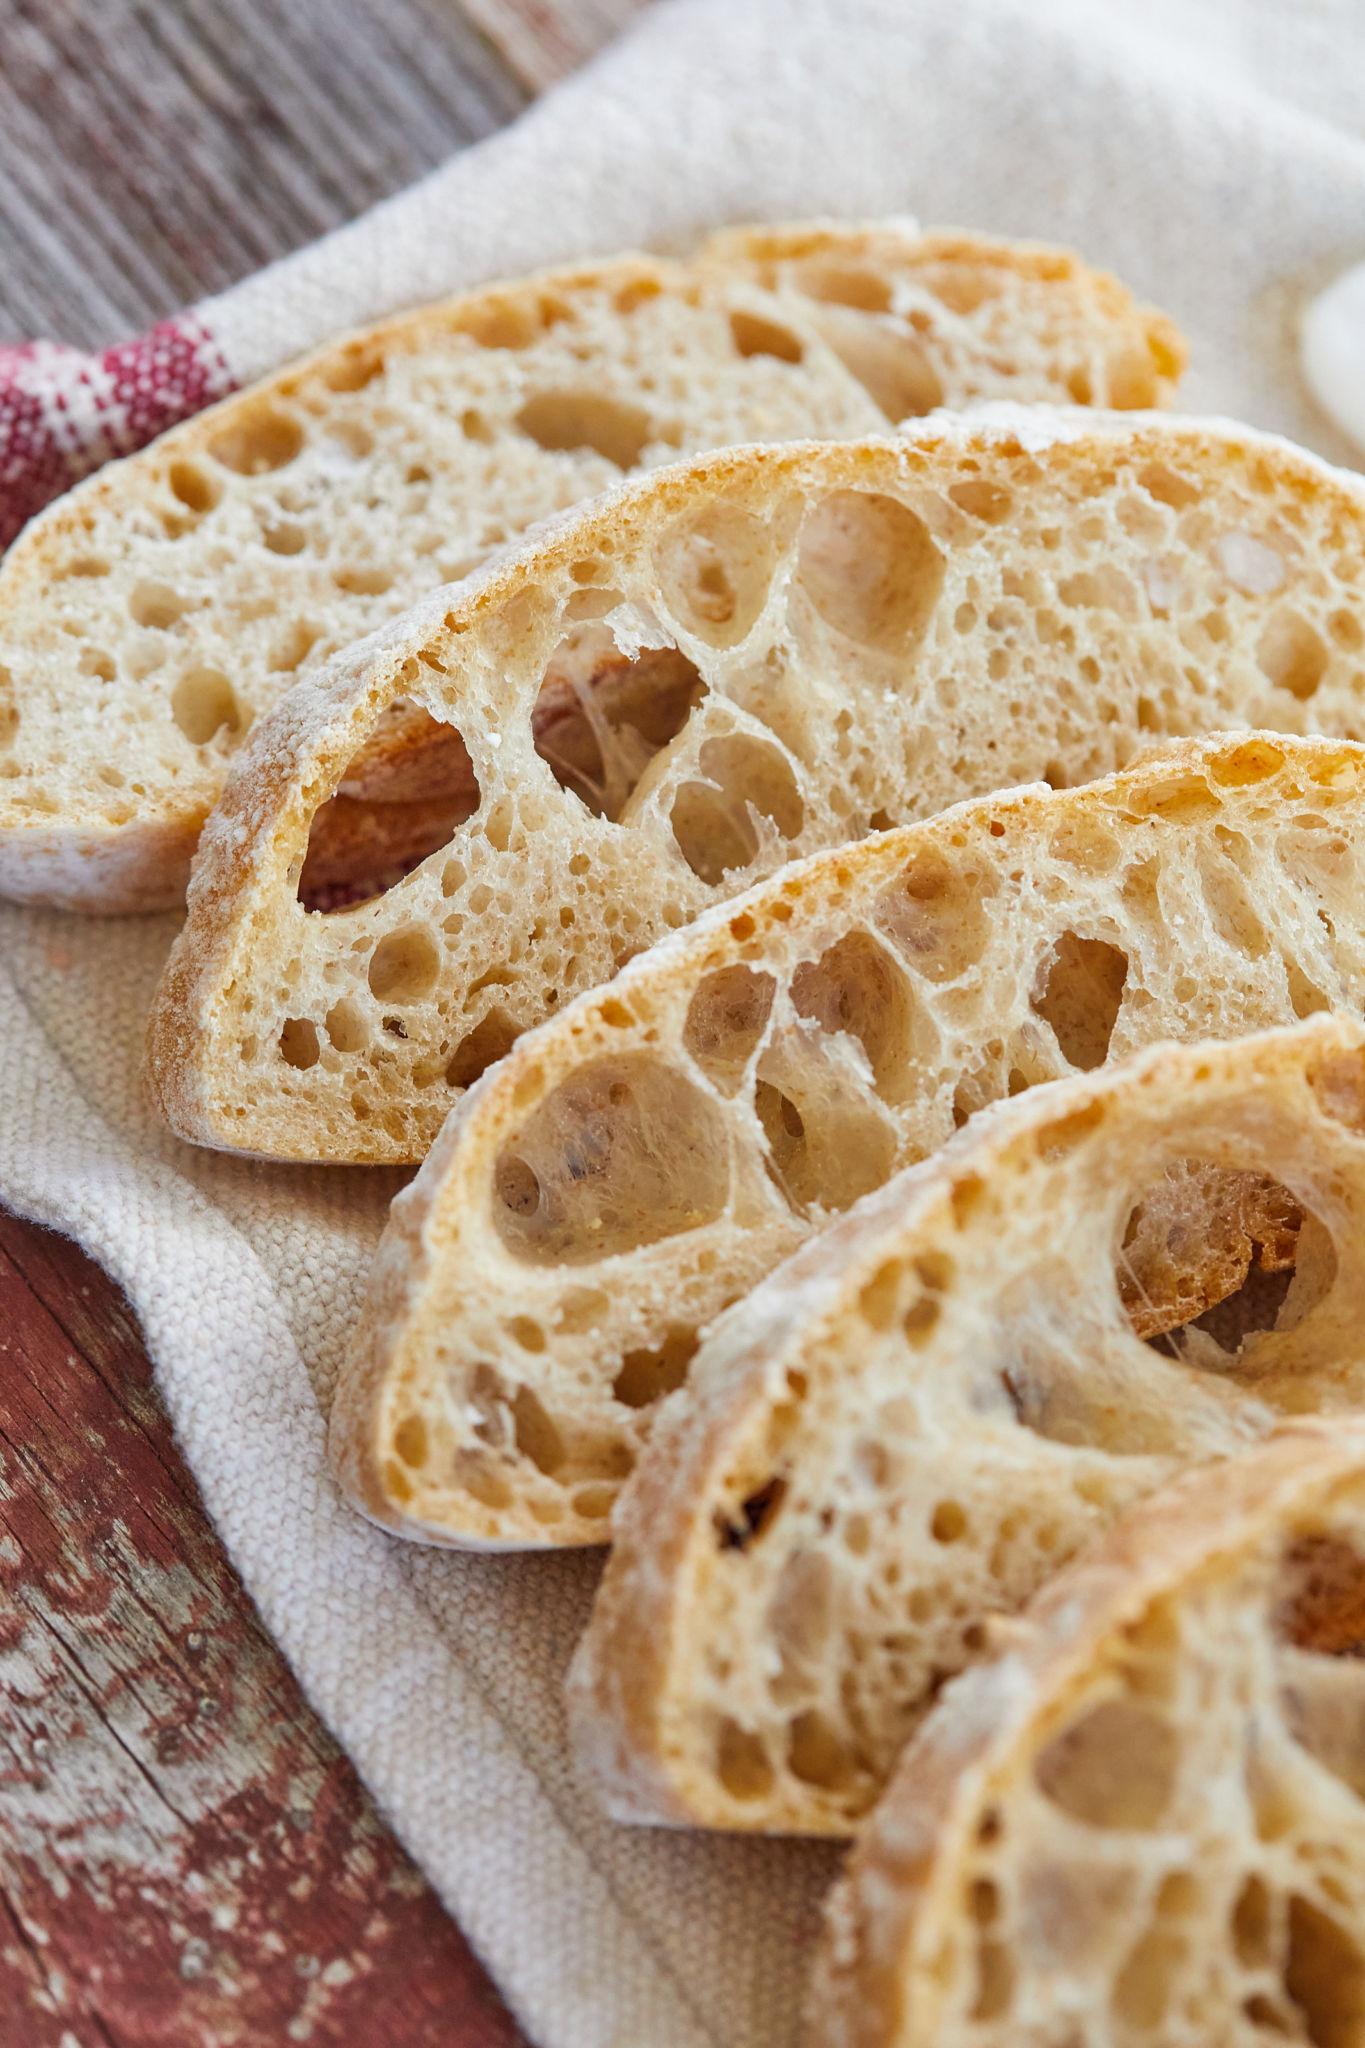 Slices of no-knead ciabatta bread spread out on a cloth.